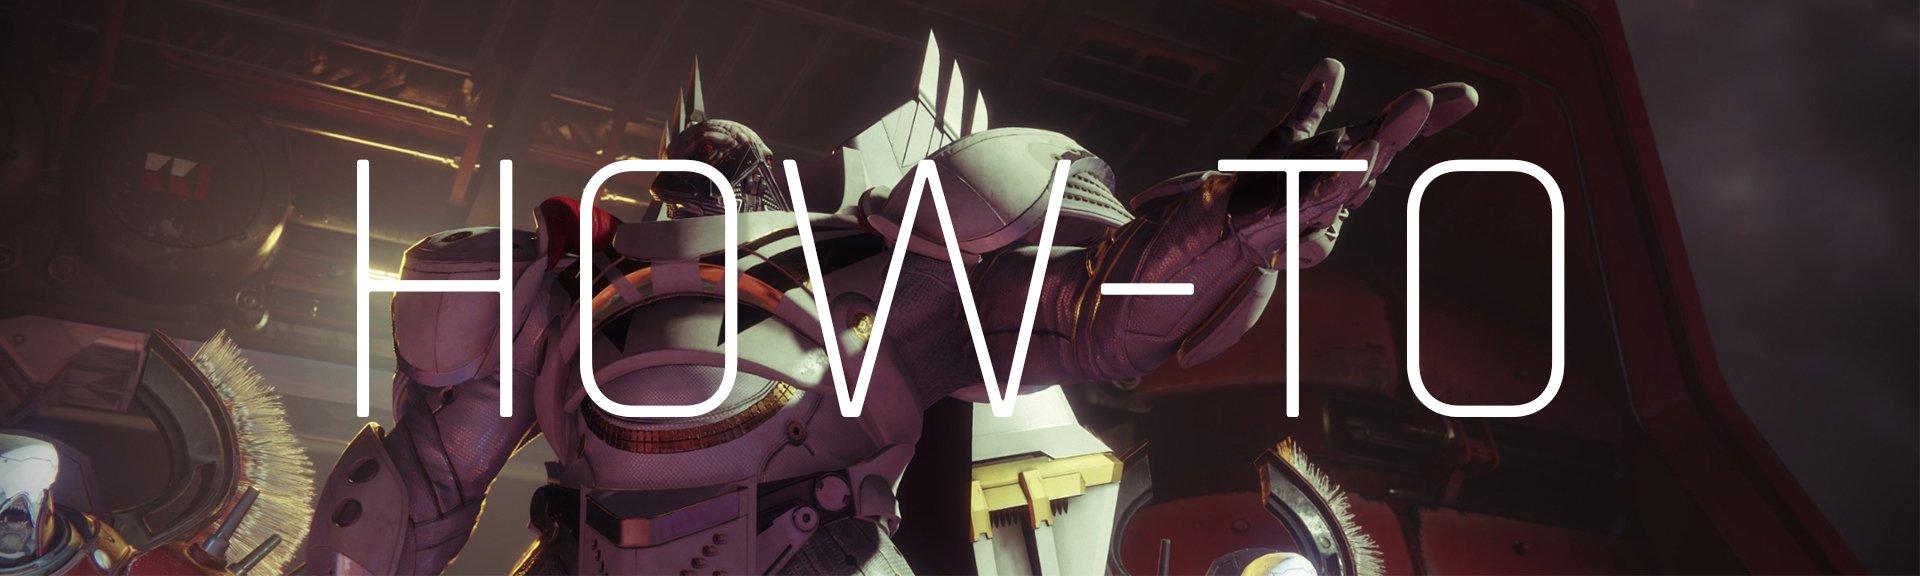 destiny-2-how-to-articles.jpg